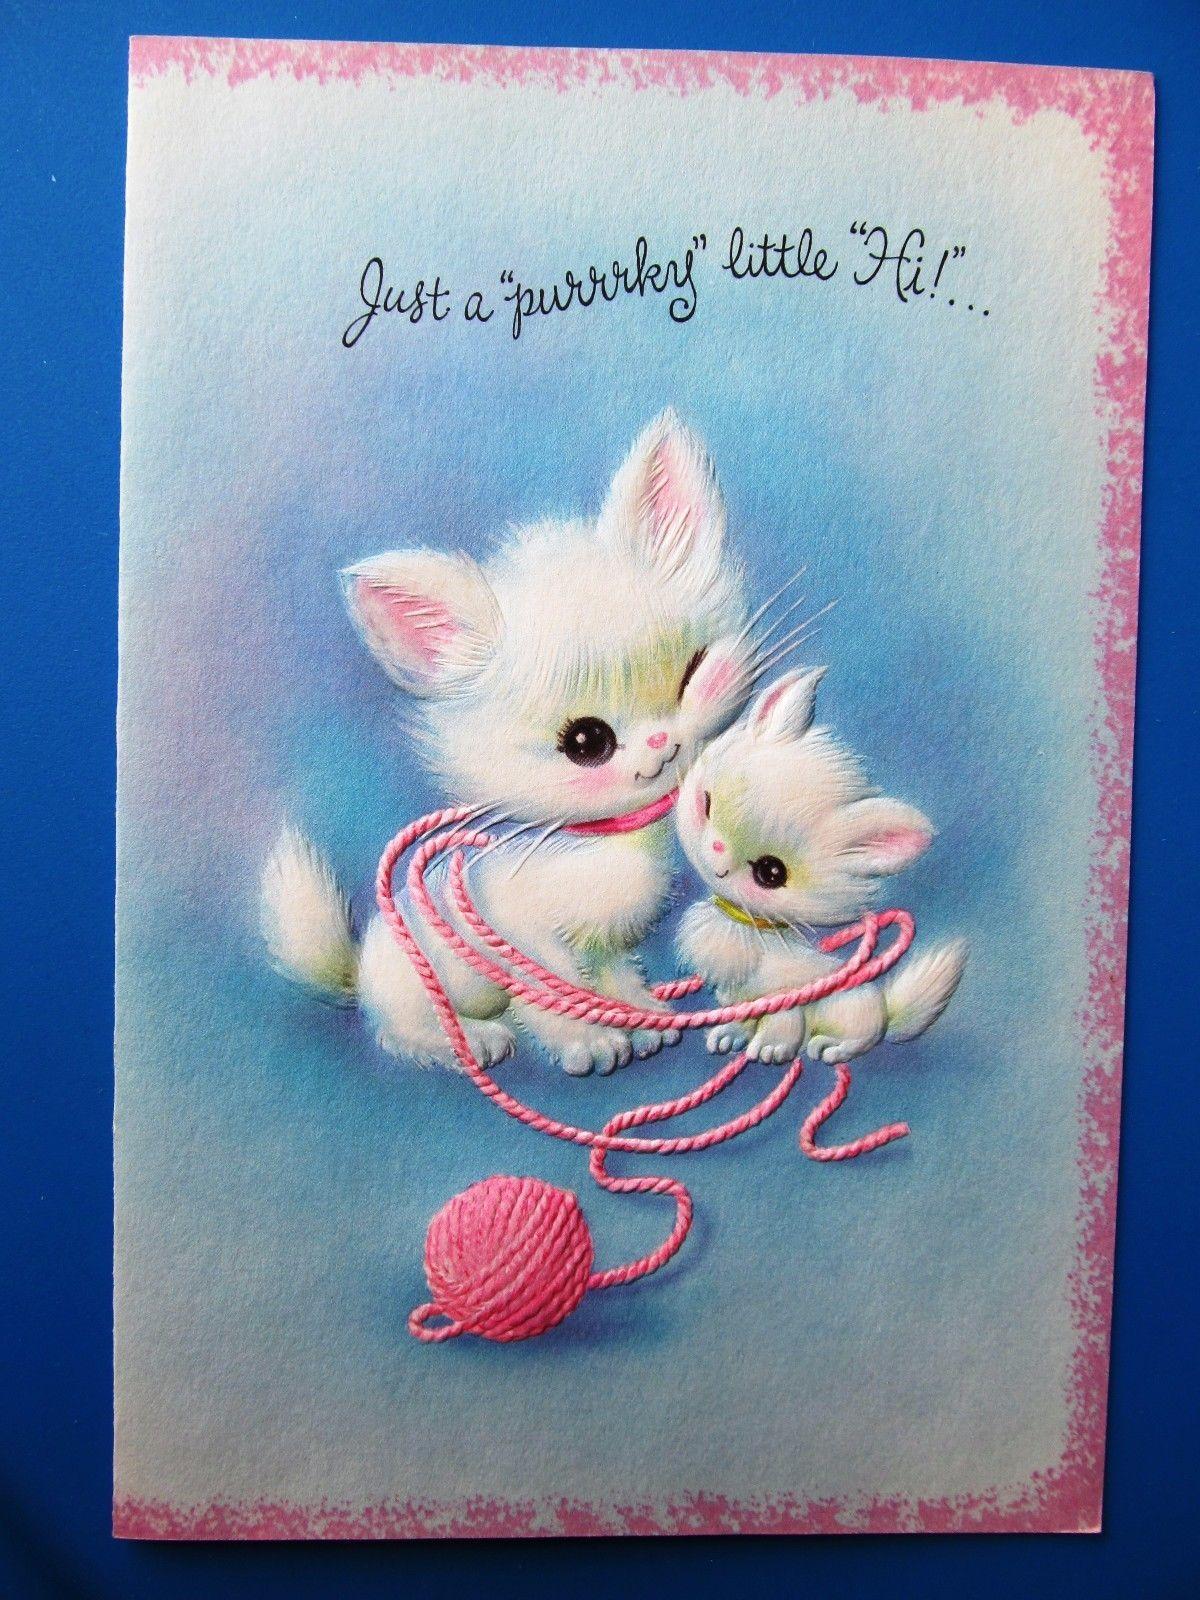 White Kittens Cats Playing w Pink Yarn